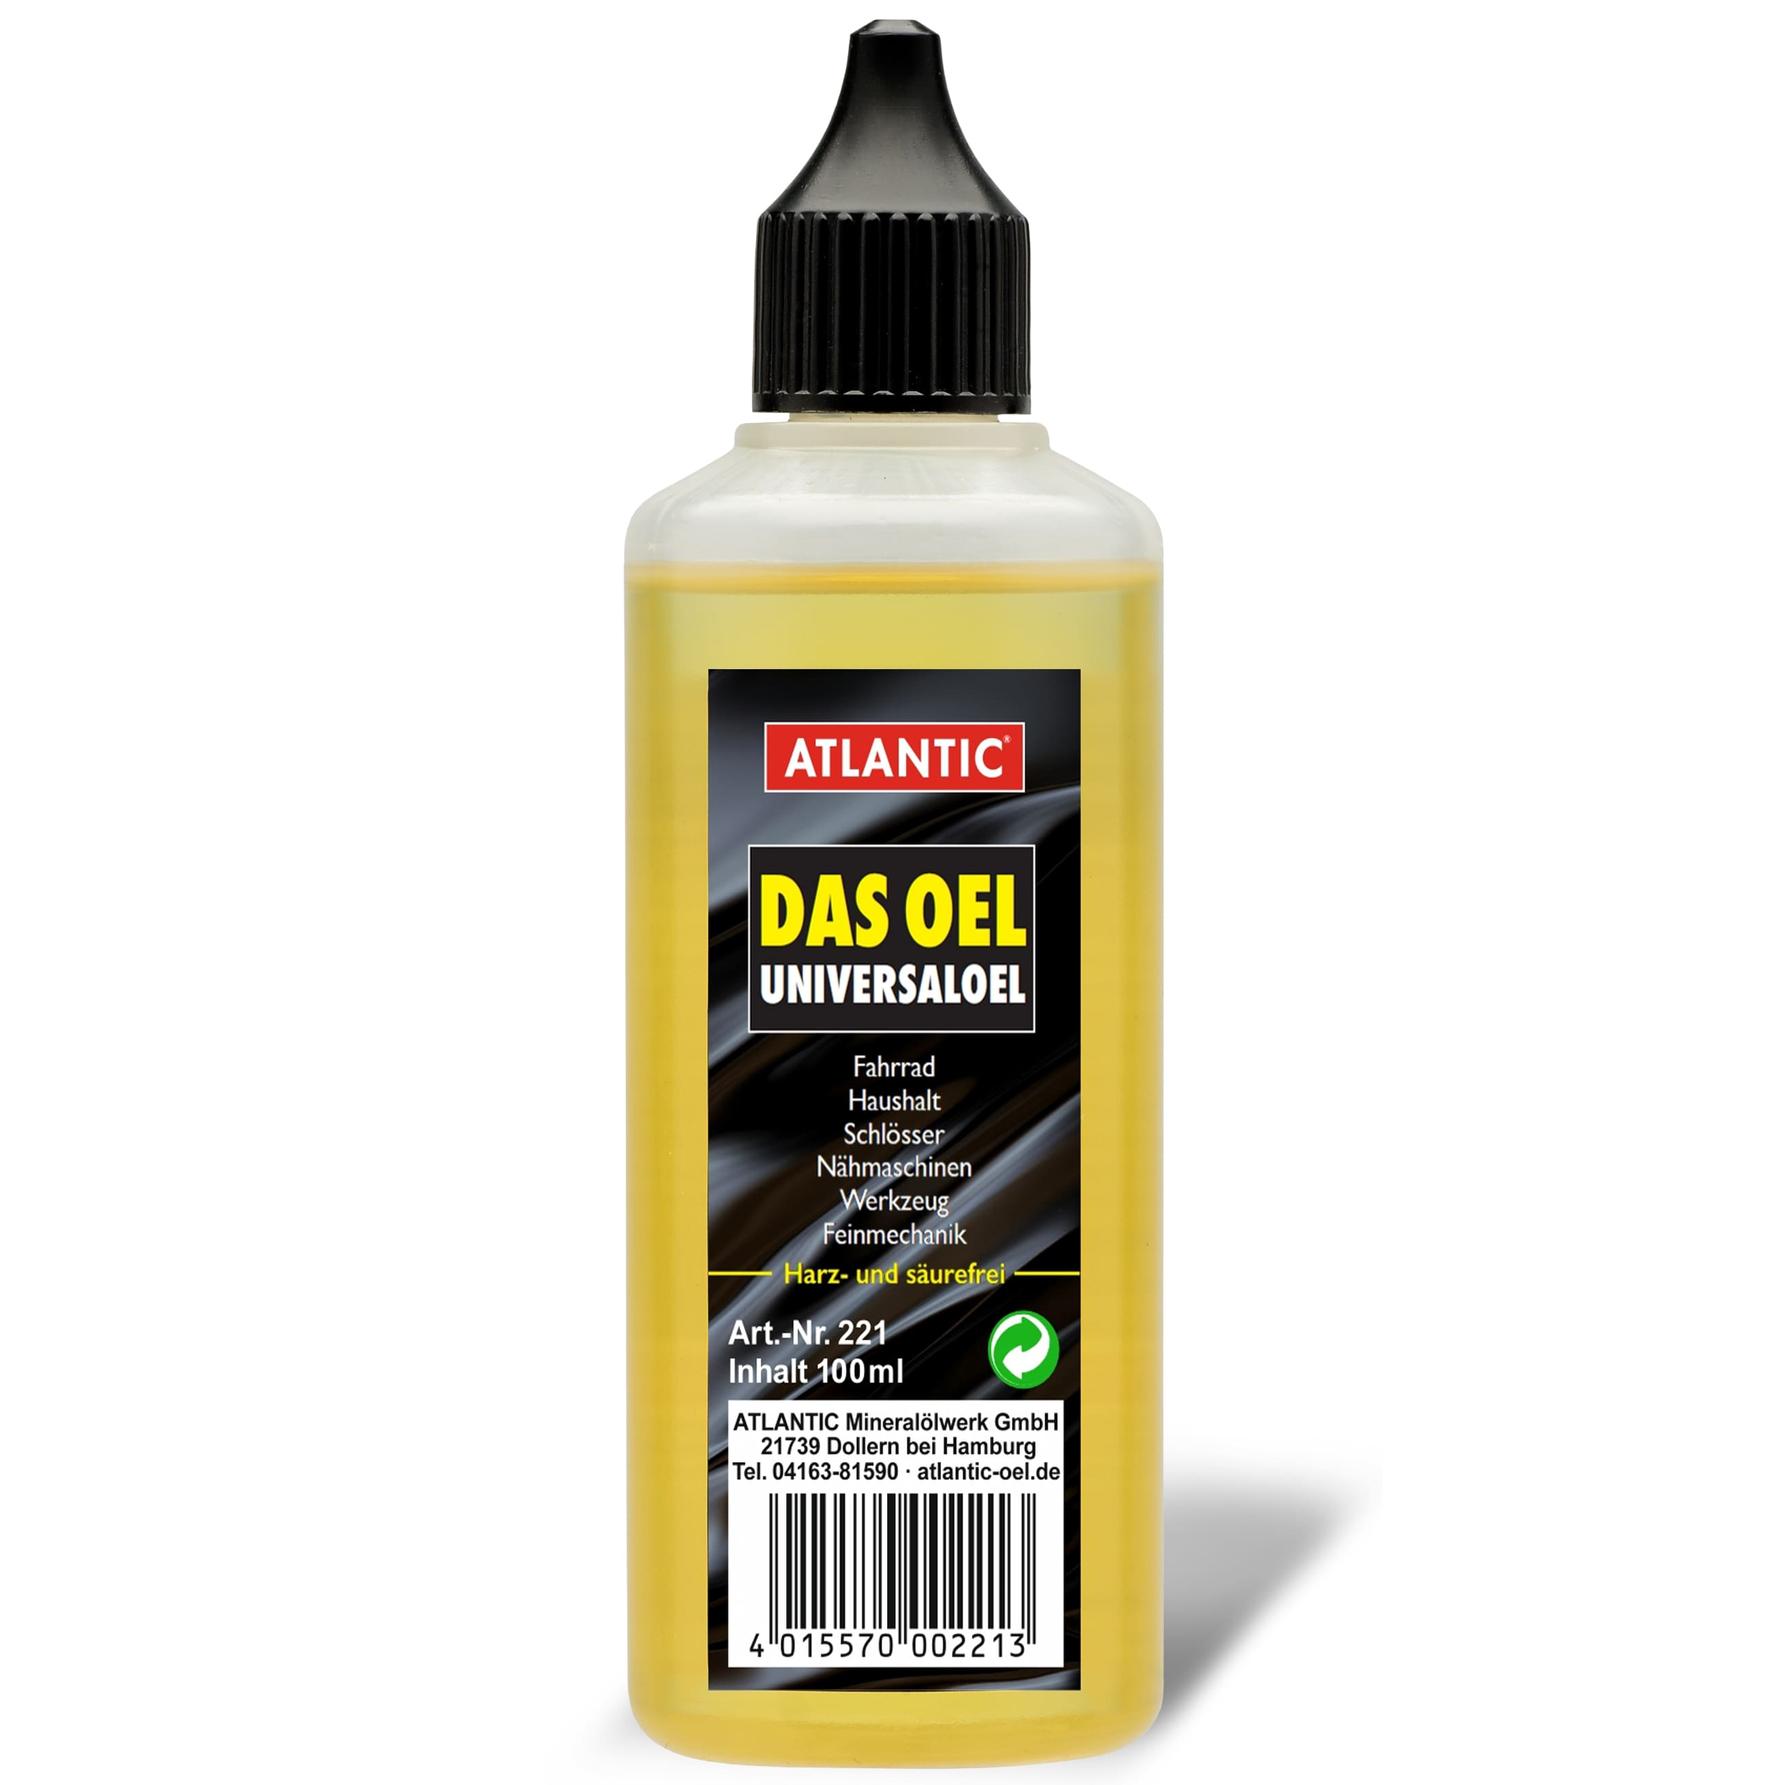 Image of Atlantic DAS OEL - Universal Oil - 100 ml Dropper Bottle